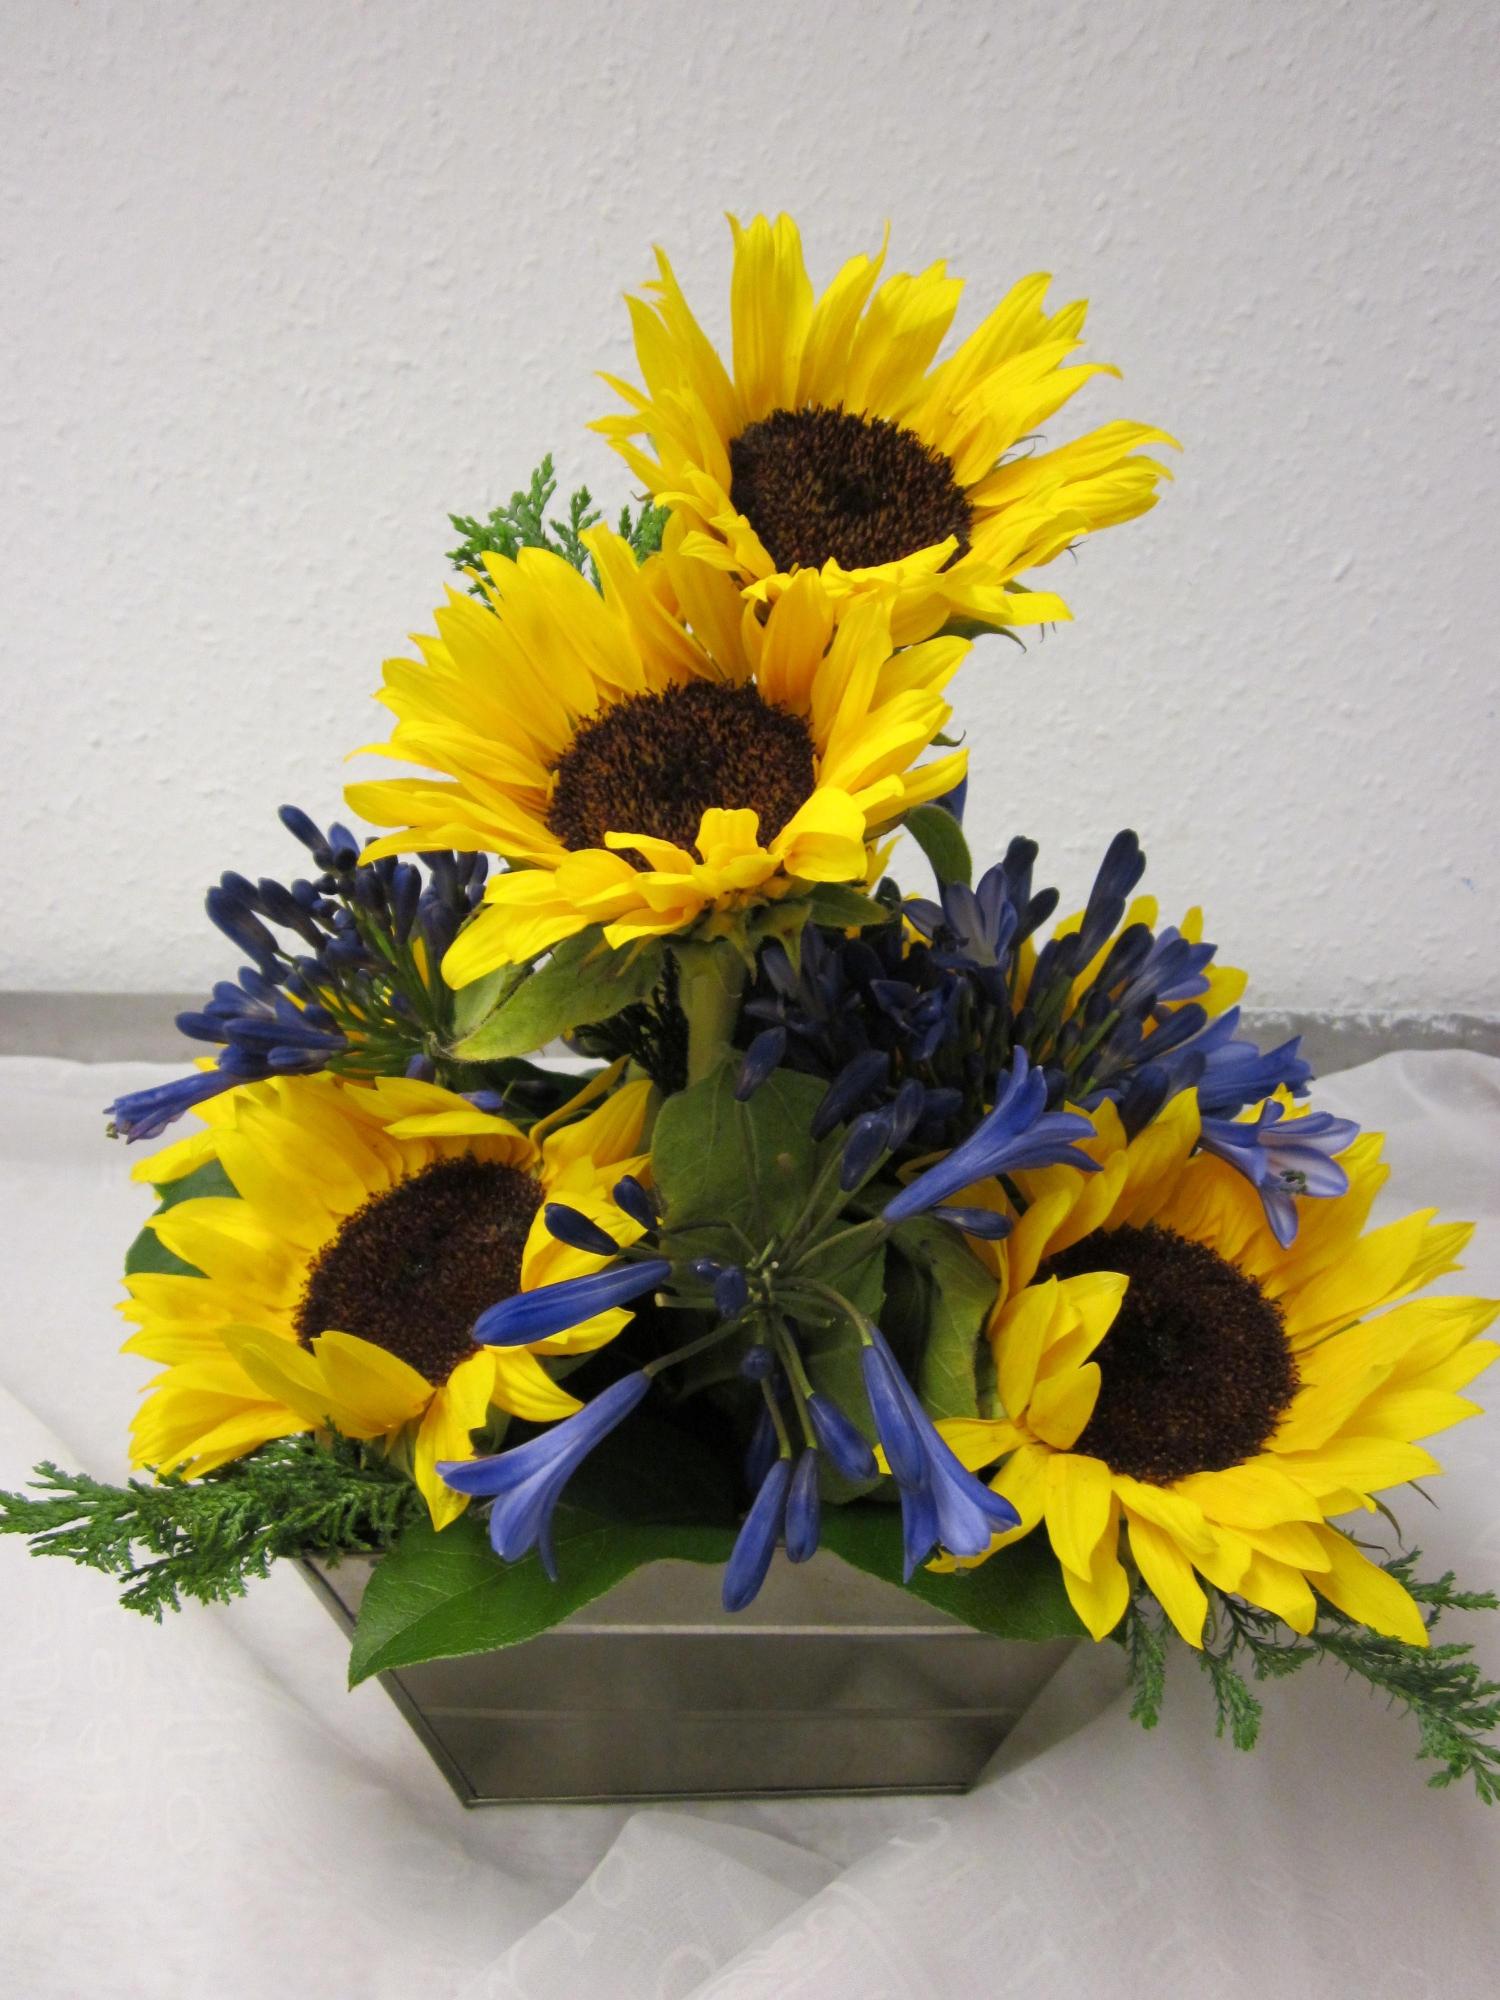 Sunflower arrangement pictures